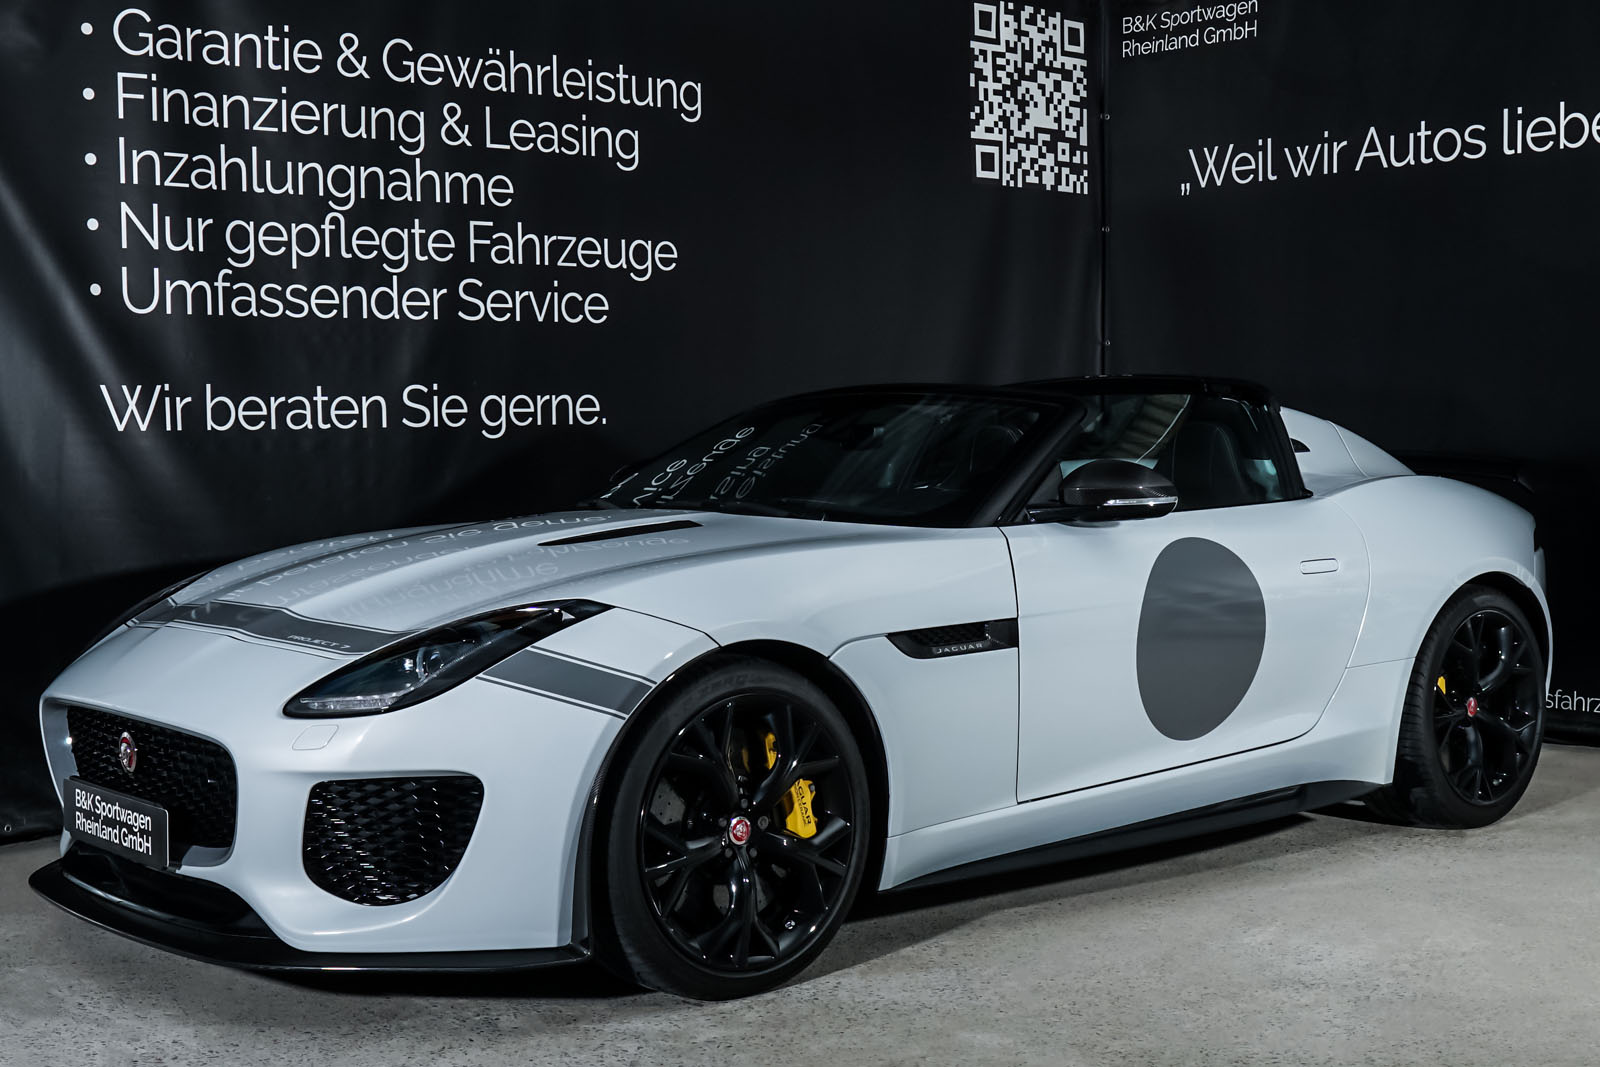 Jaguar_Project7_Weiss_Schwarz_JAG-0829_9_w